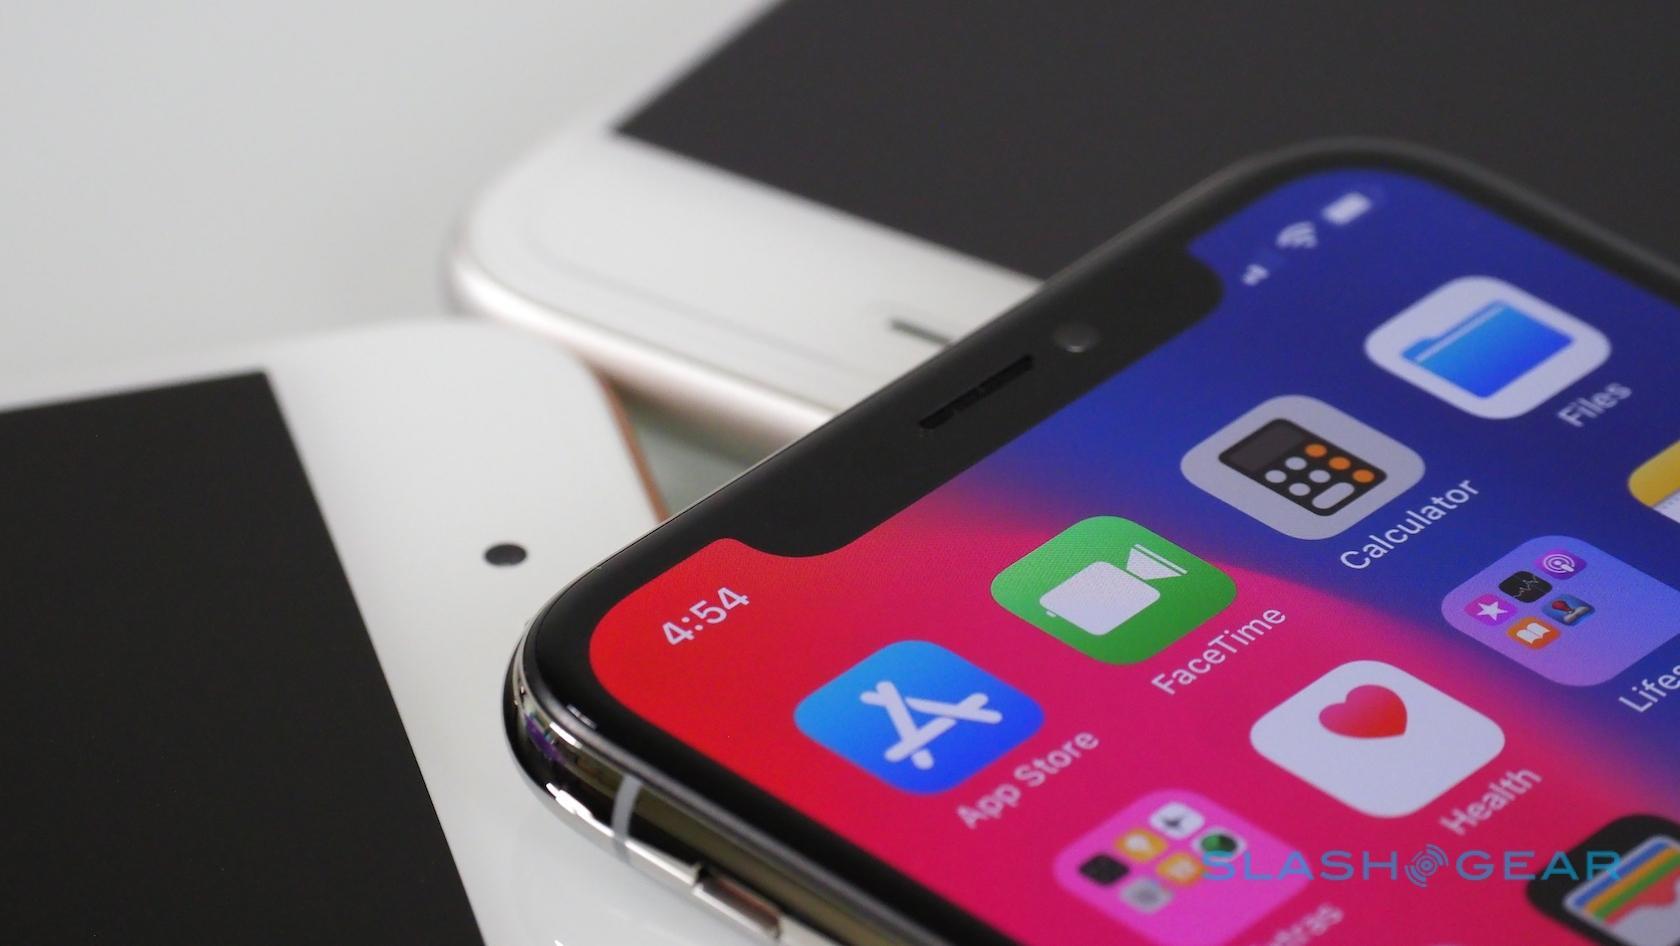 2018 iPhone X 6 5-inch with LG Display OLED tipped - SlashGear